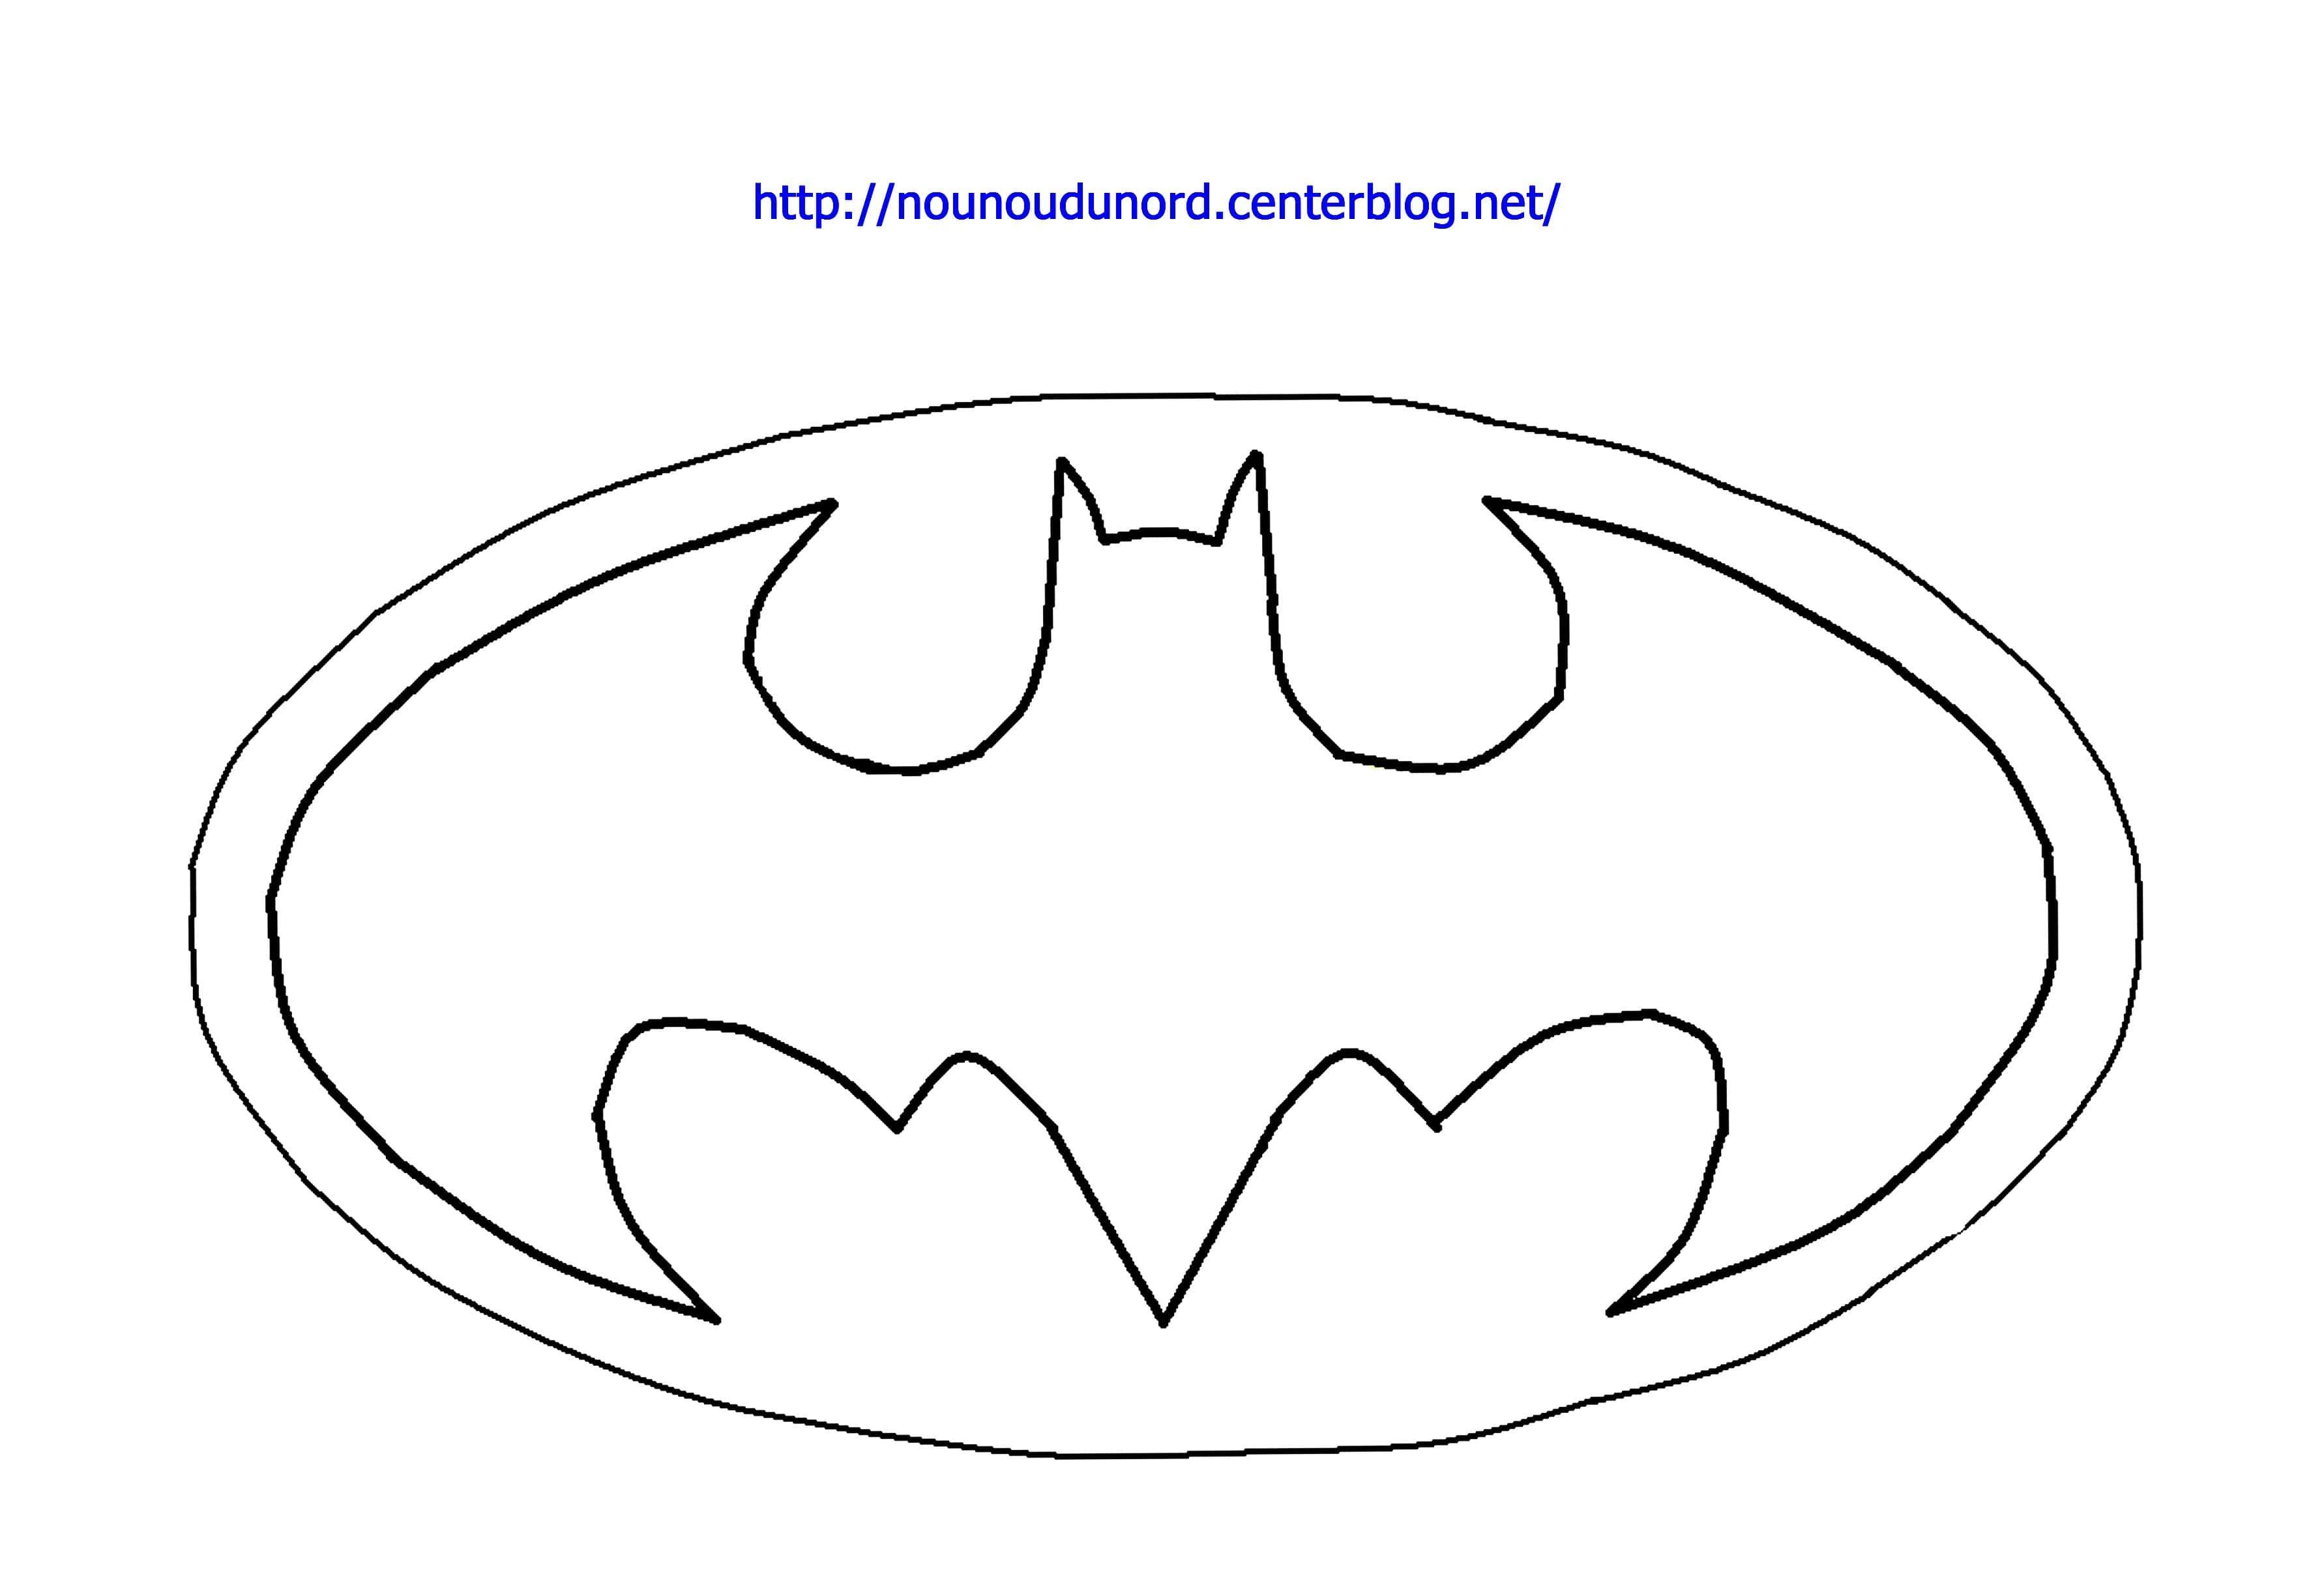 Dessin Gratuit Batman A Imprimer Coloriage Batman Logo Batman Coloriage